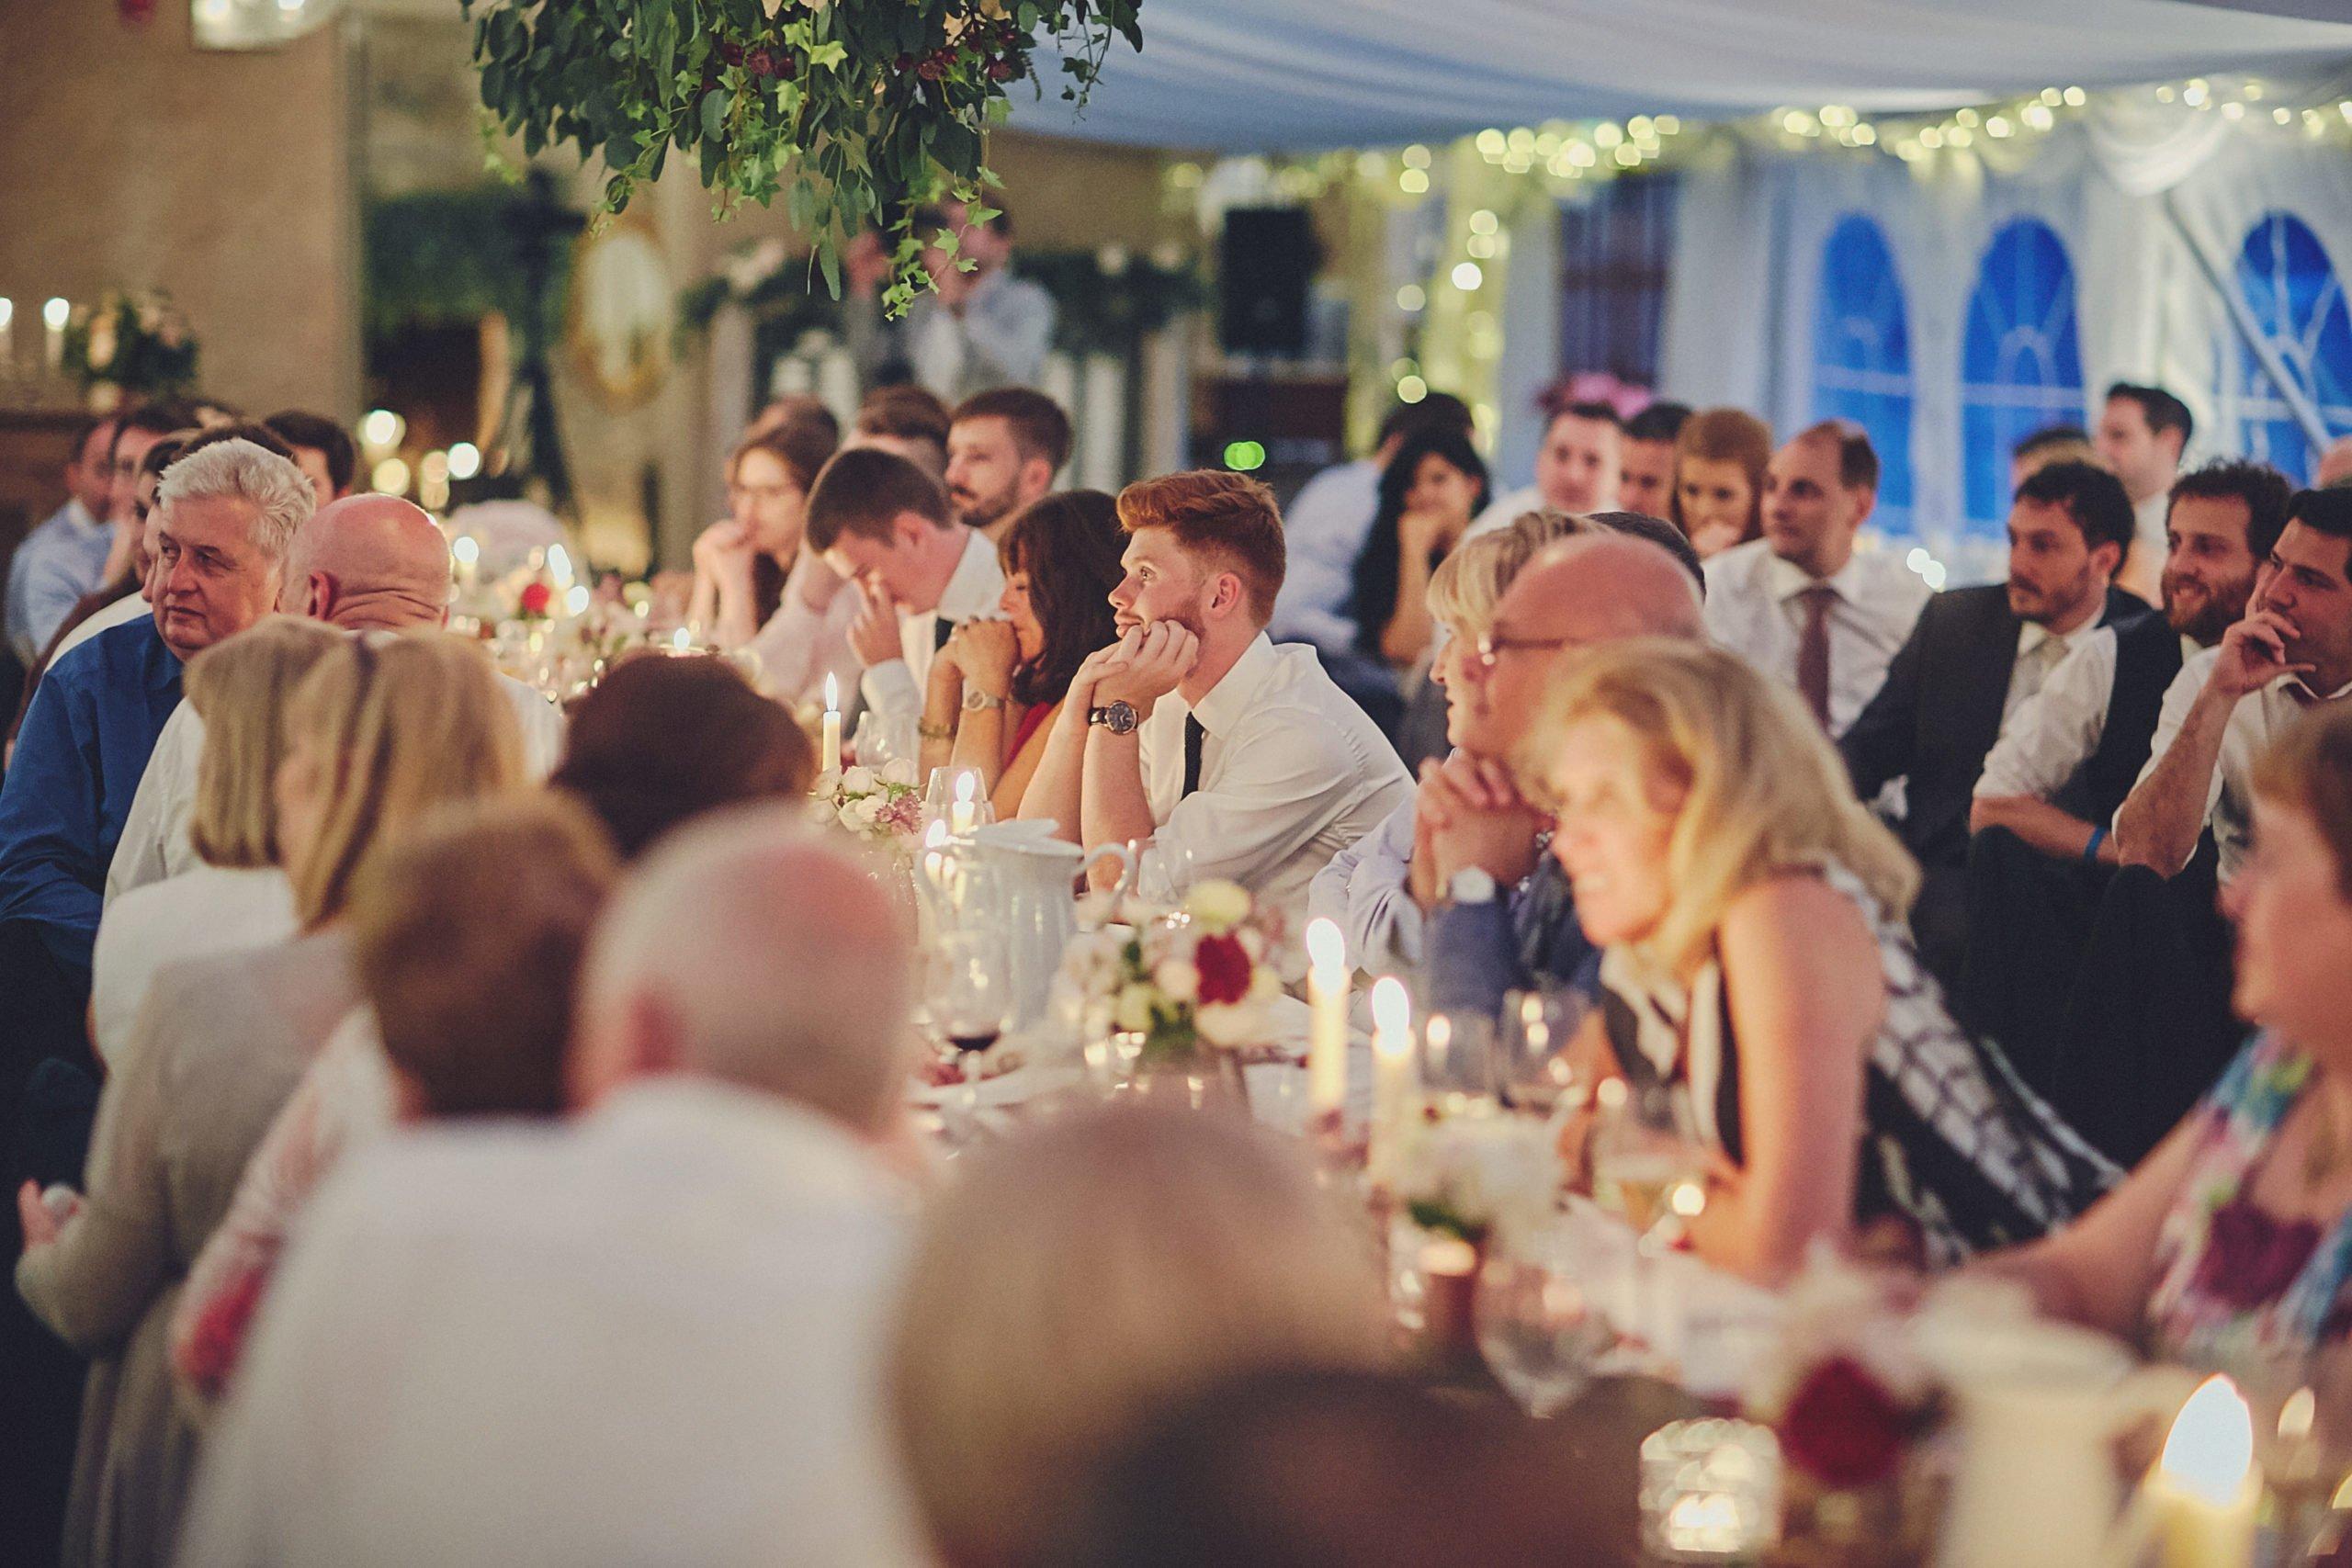 Cloughjordan House Wedding - Alternative Venue 135